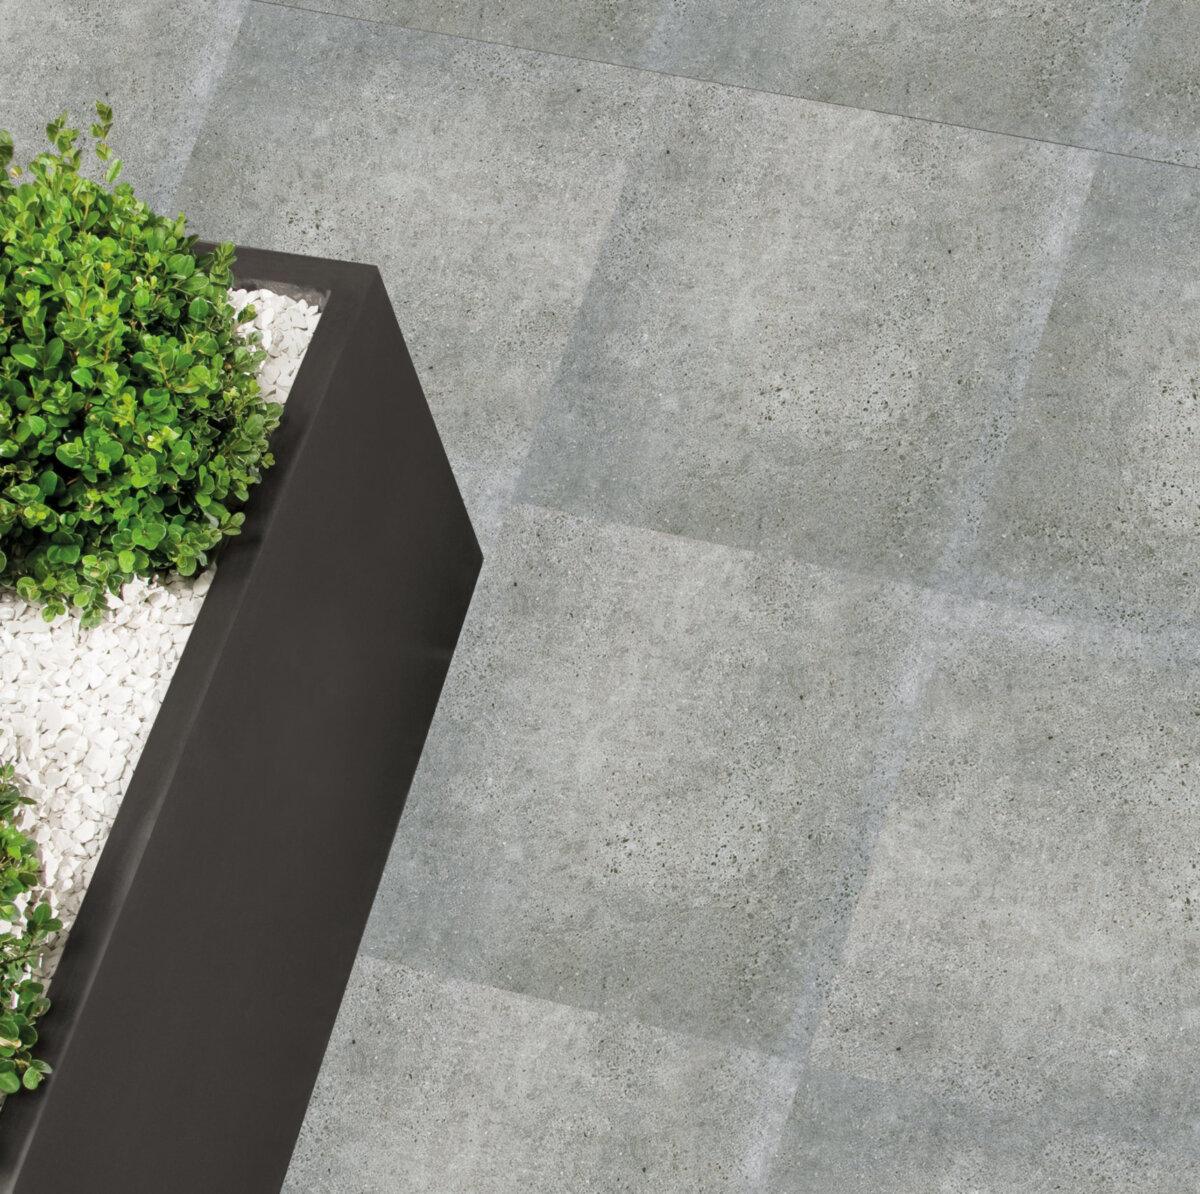 Essence Roma Grigio SR Rectified 600x600mm_Stiles_Lifestyle_Image